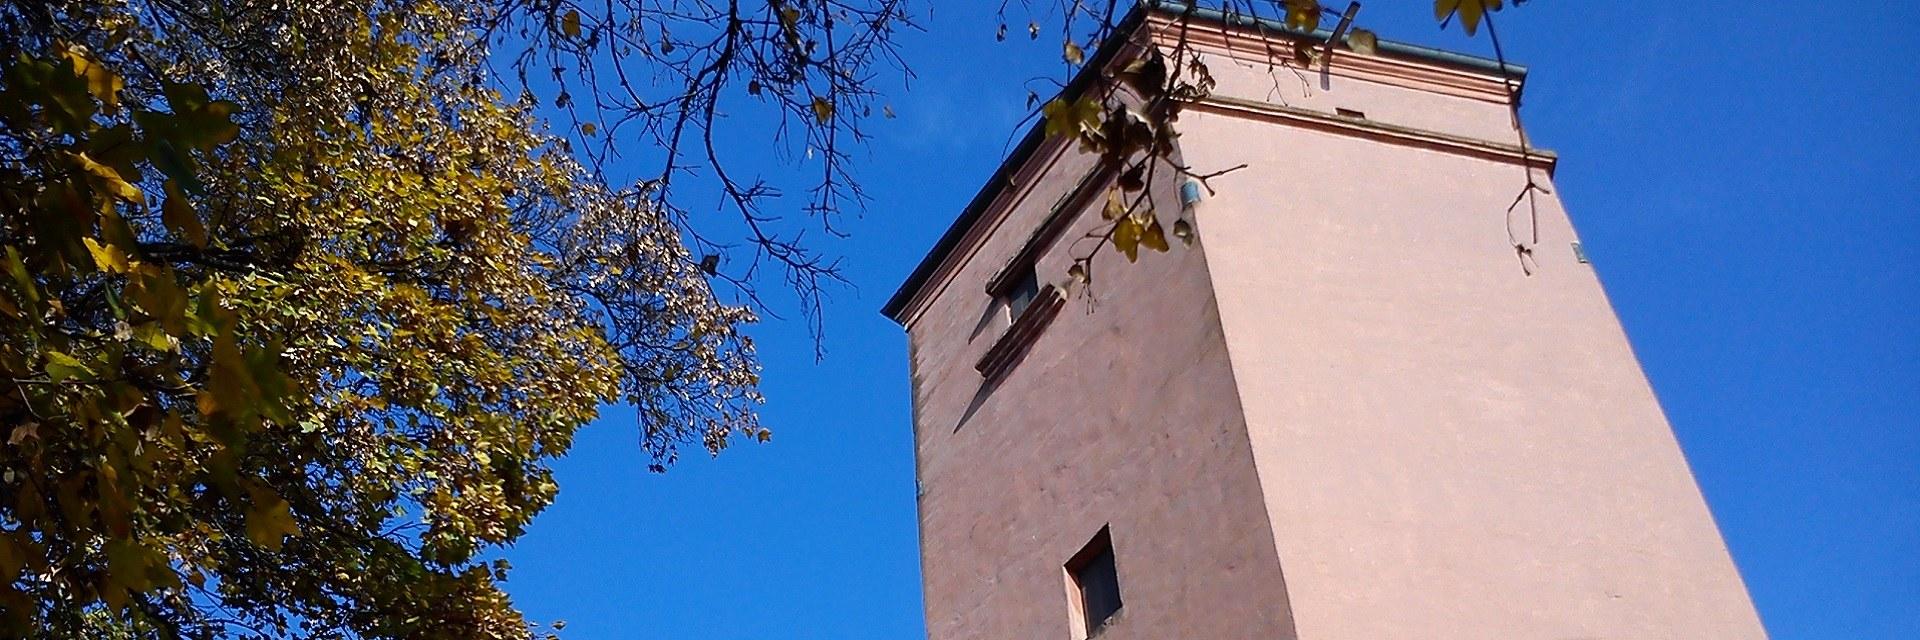 La torre pentagonale